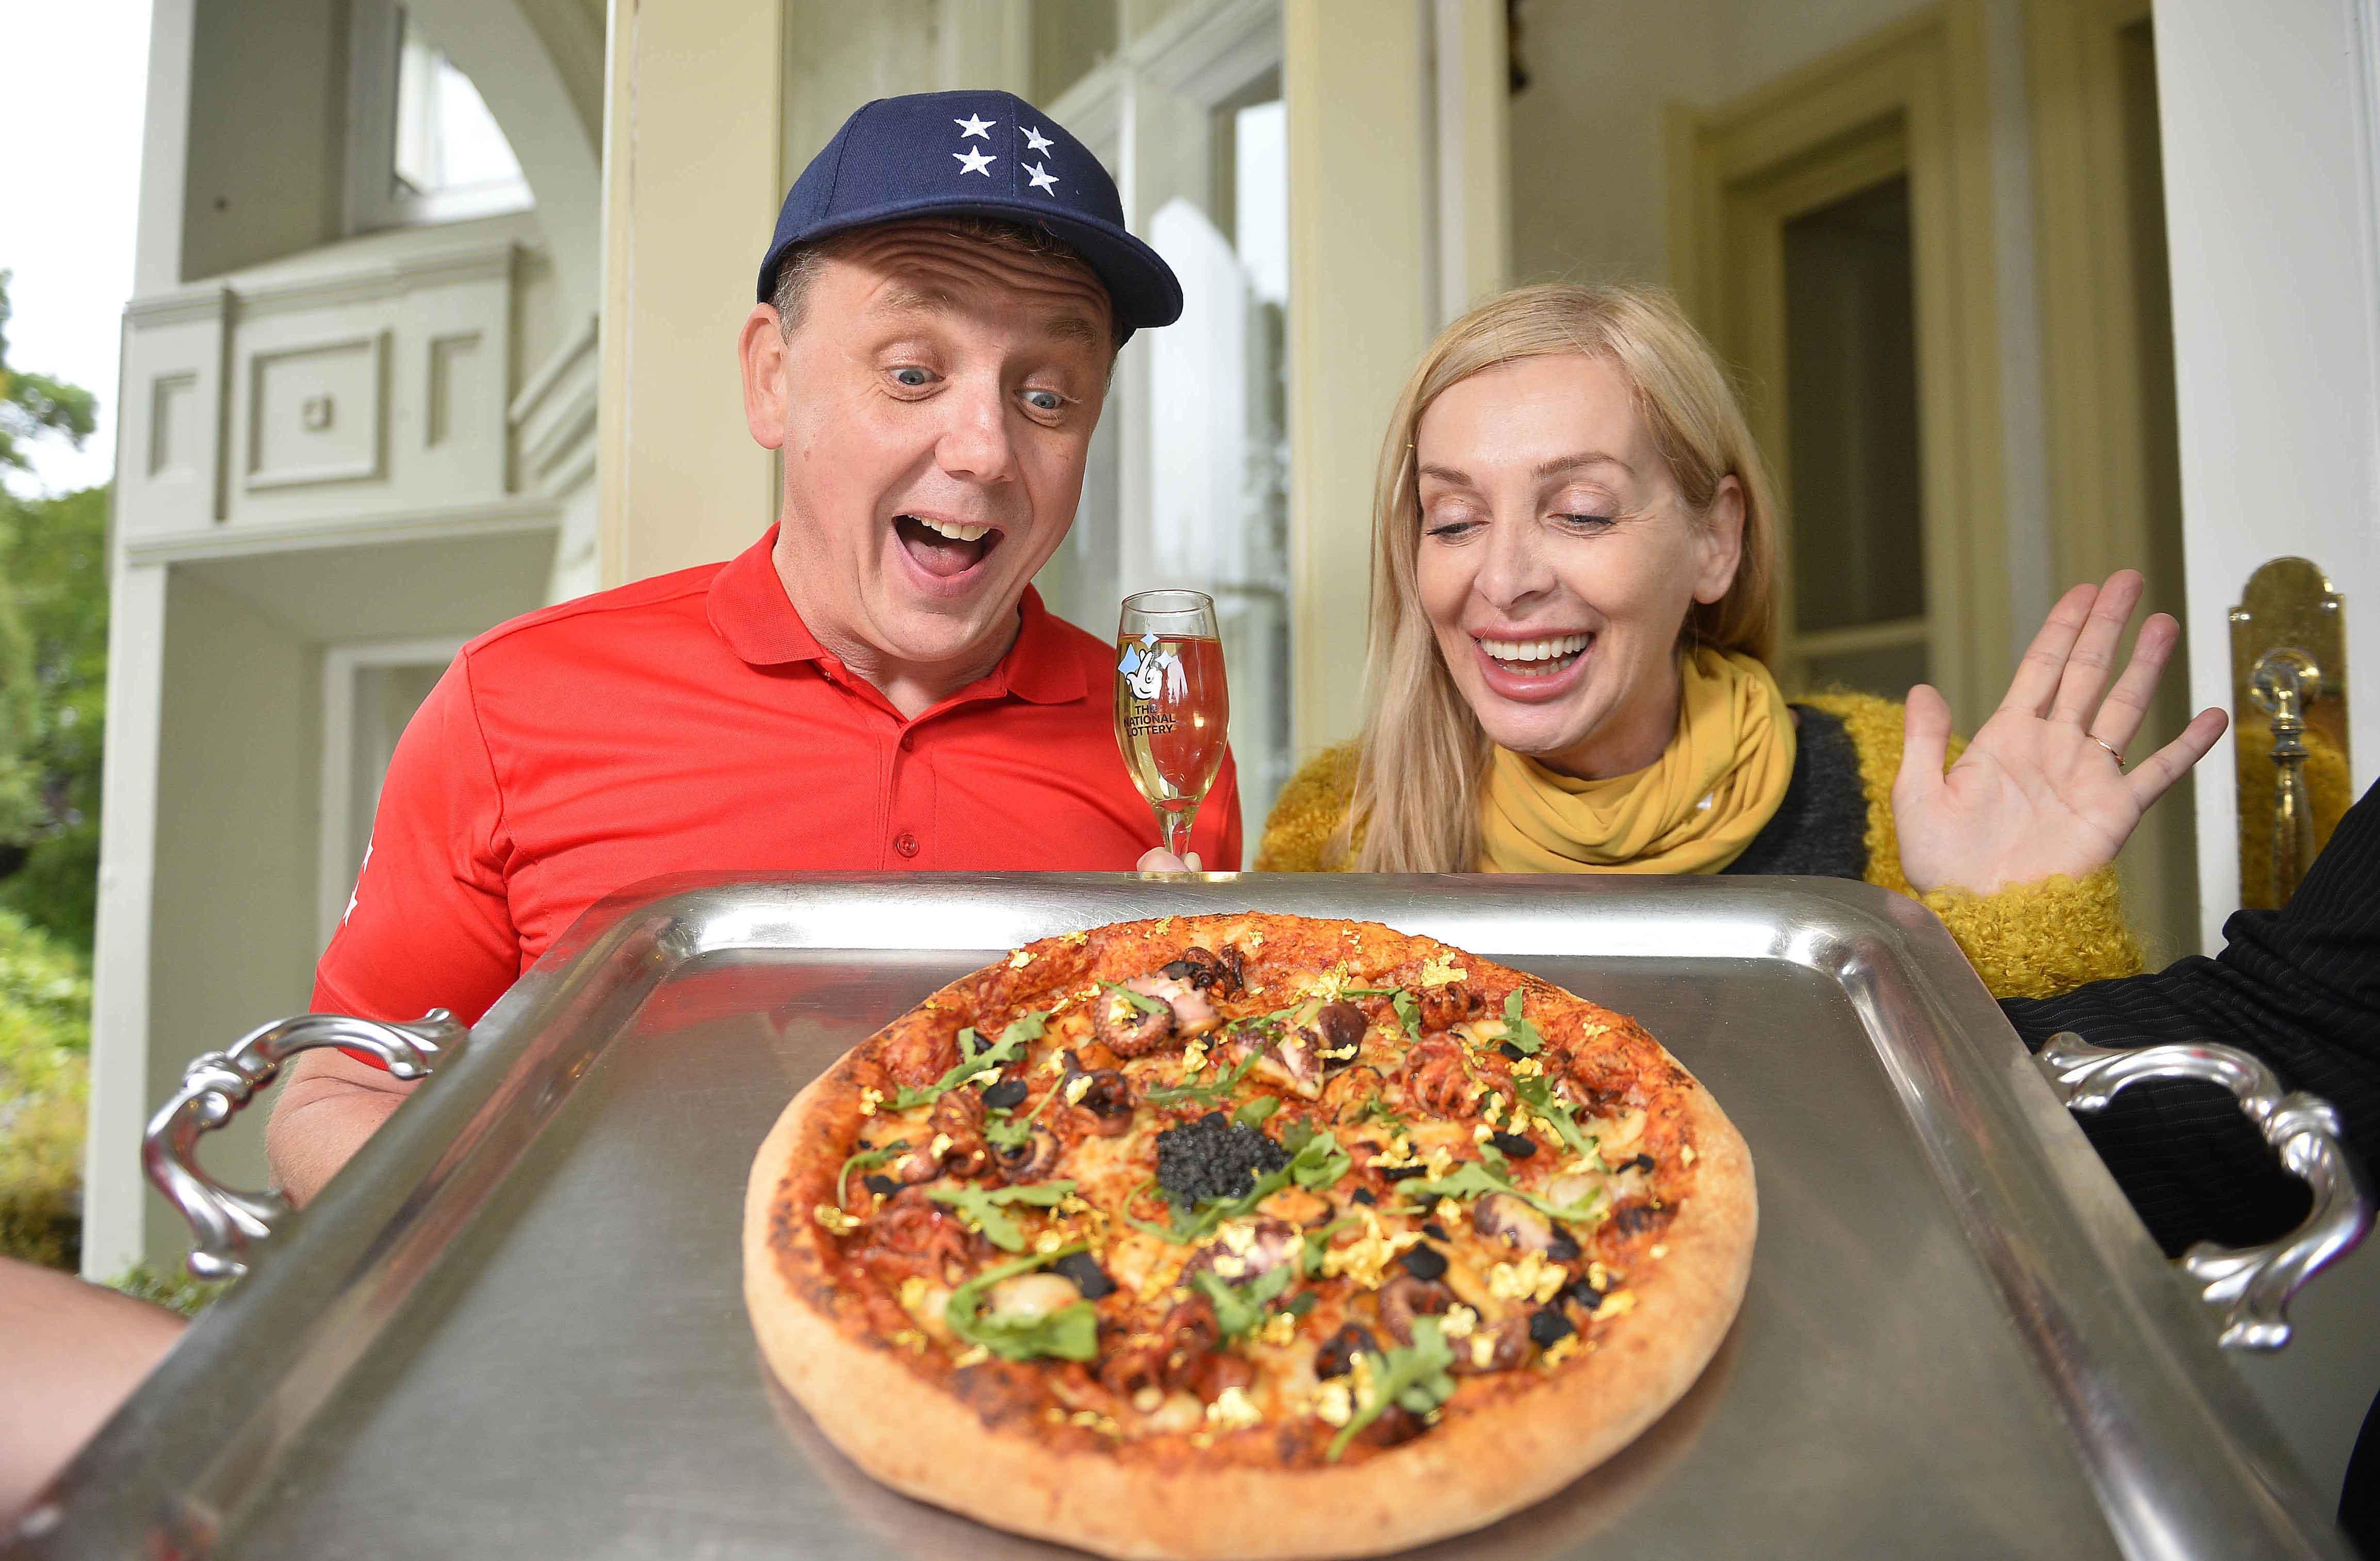 Multi-Millionaire Pizza #1